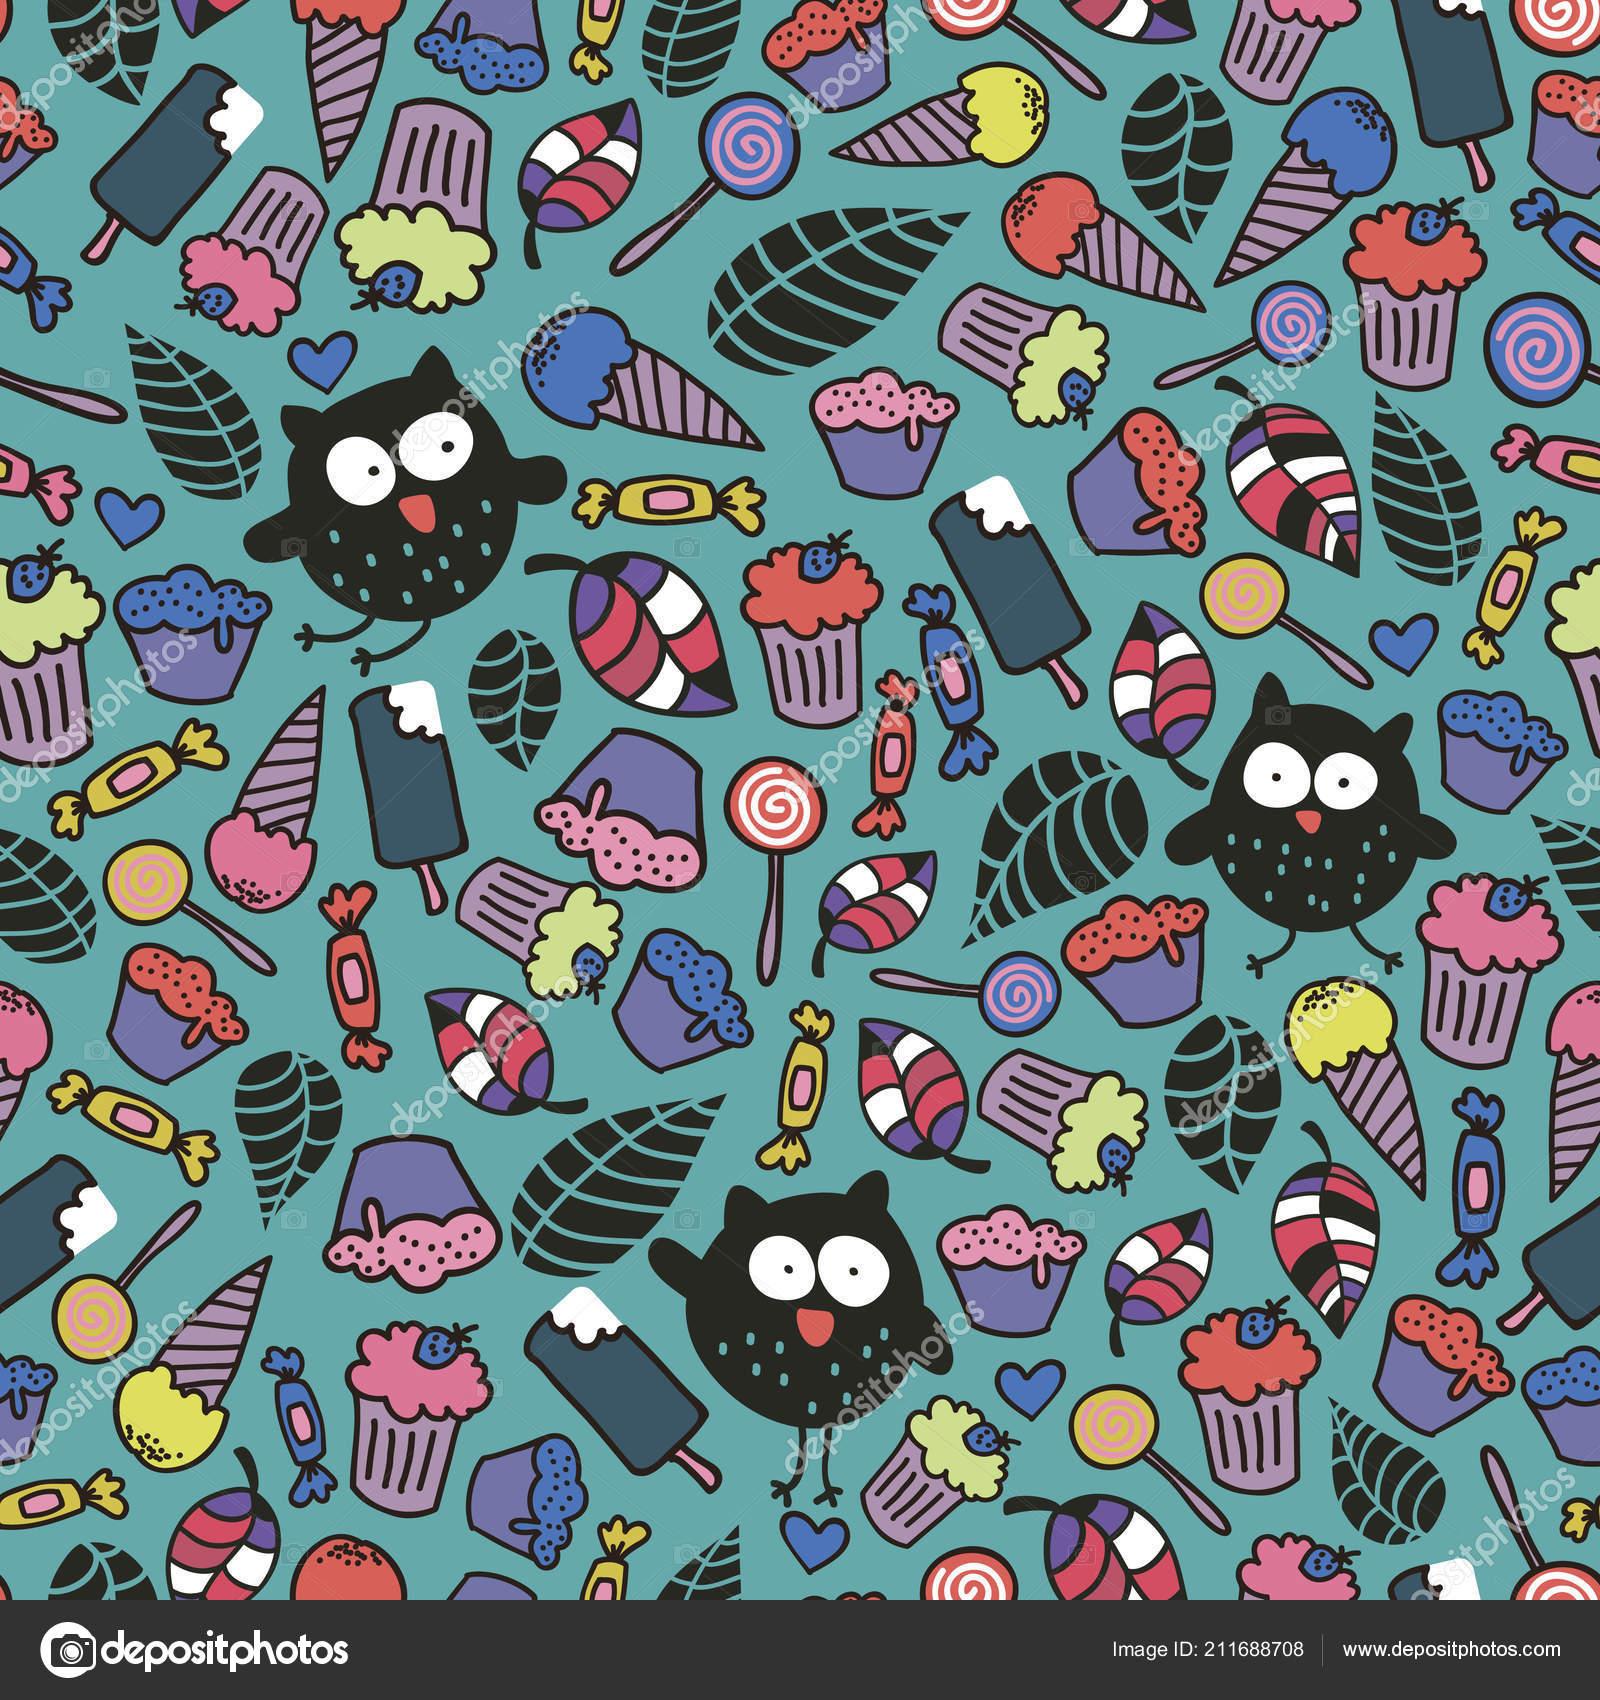 Cute Owl Wallpaper Endless Wallpaper With Cute Crazy Owls